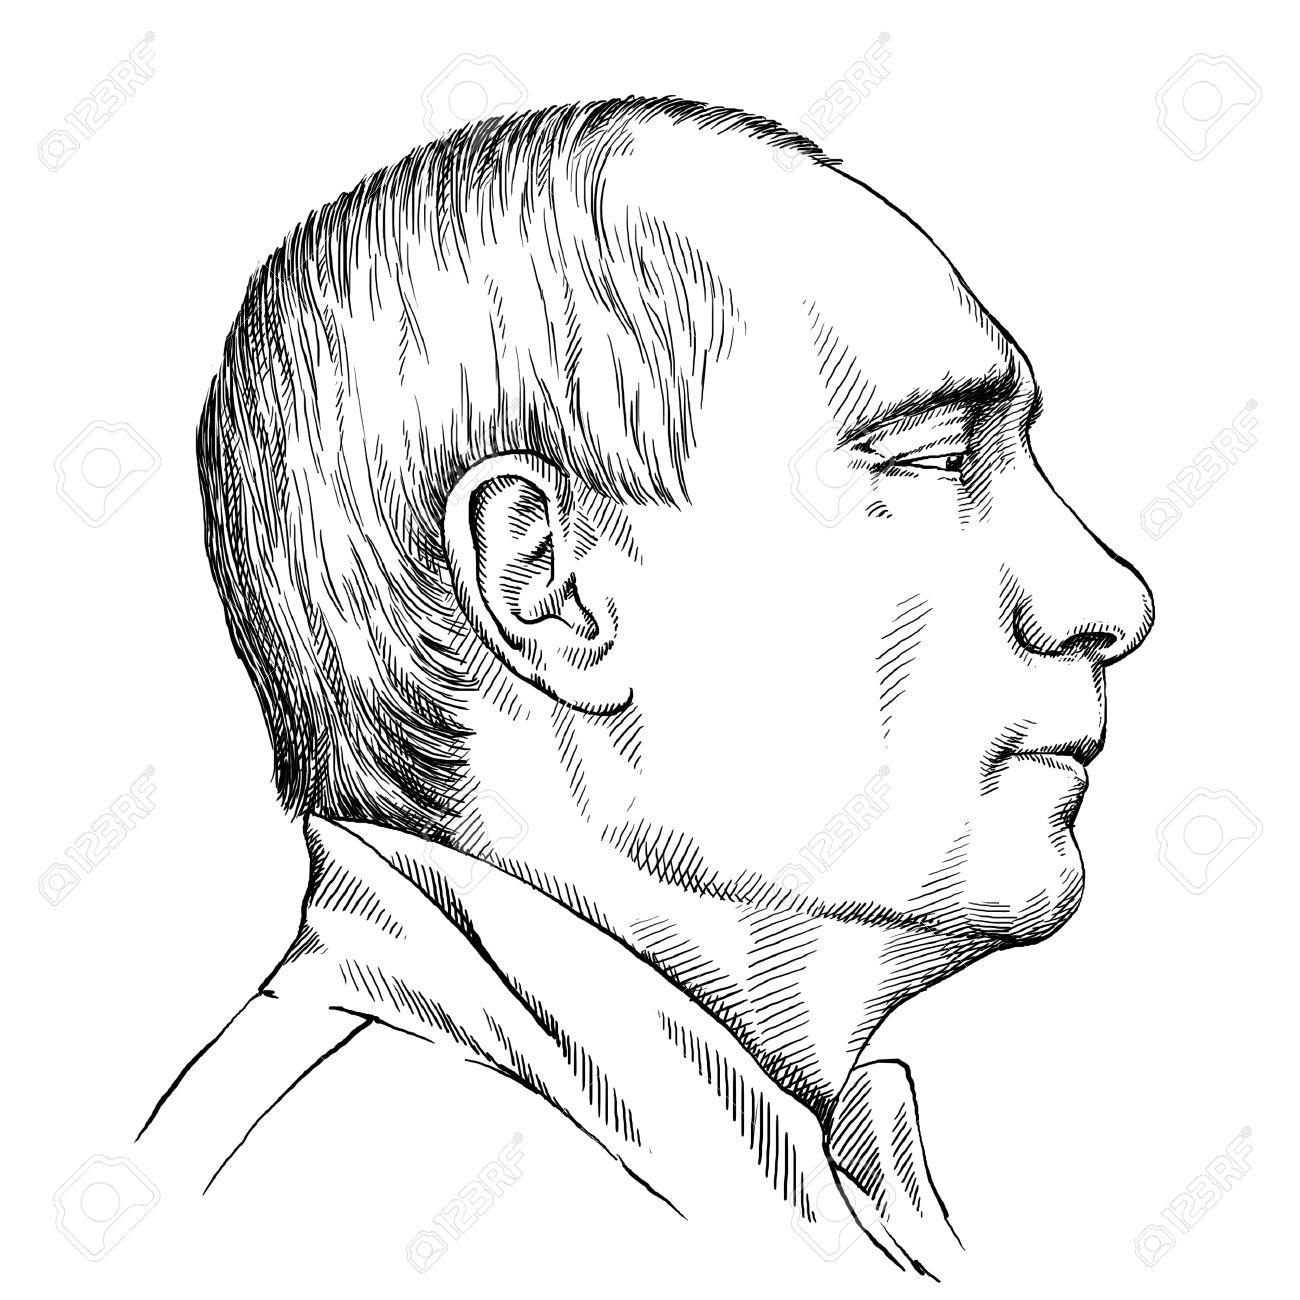 1300x1300 March 16 2015 Illustration Of President Vladimir Putin Portrait